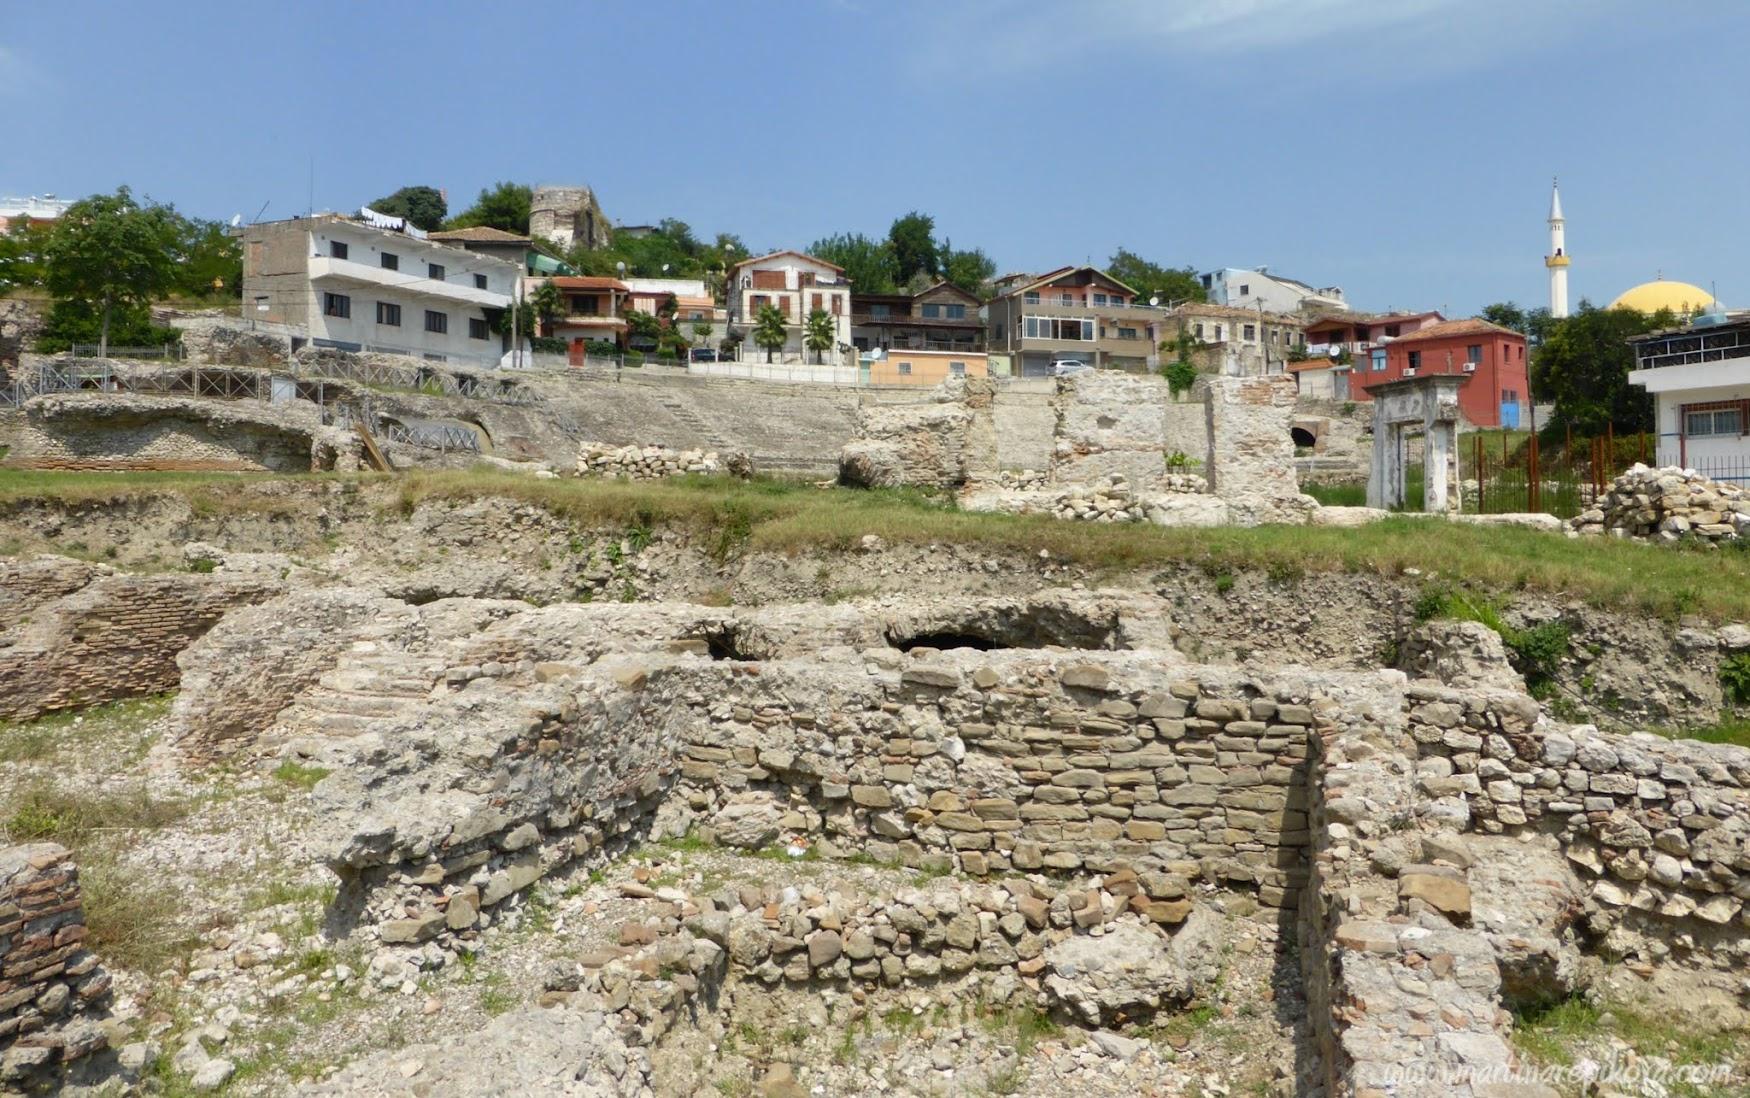 Roman Amphitheater, Durres, Albania